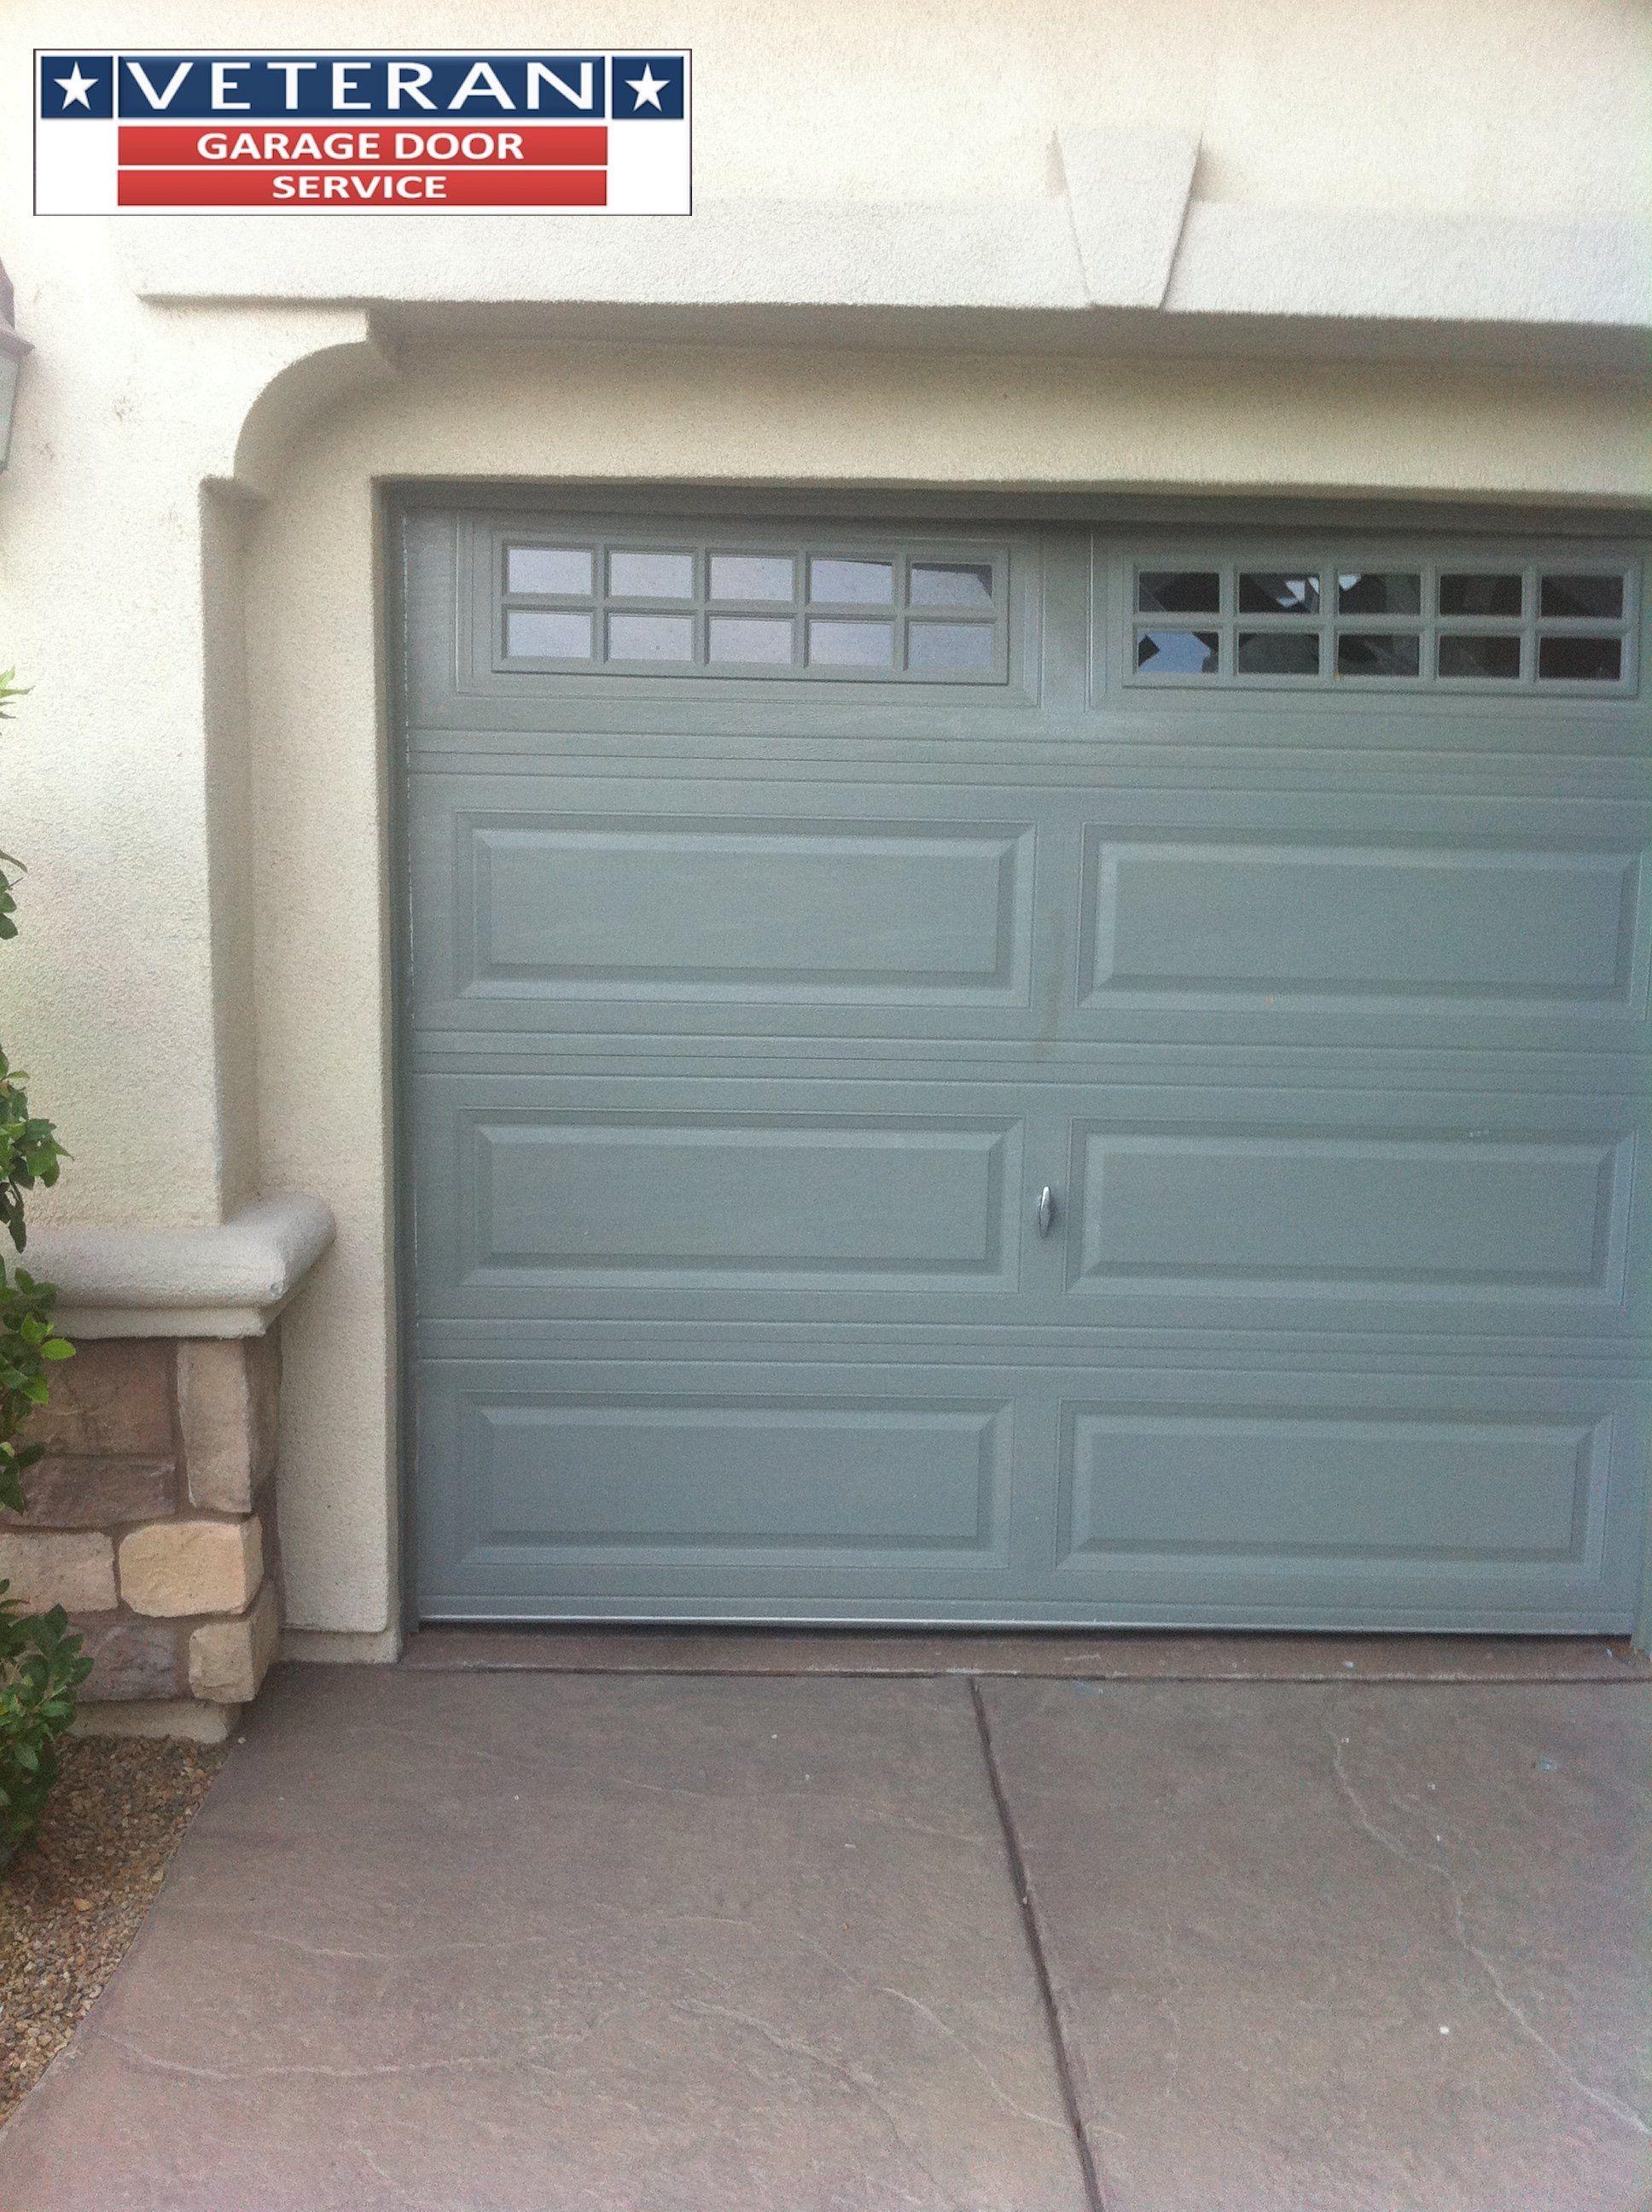 Exceptional Craftsman Garage Door Locked Out